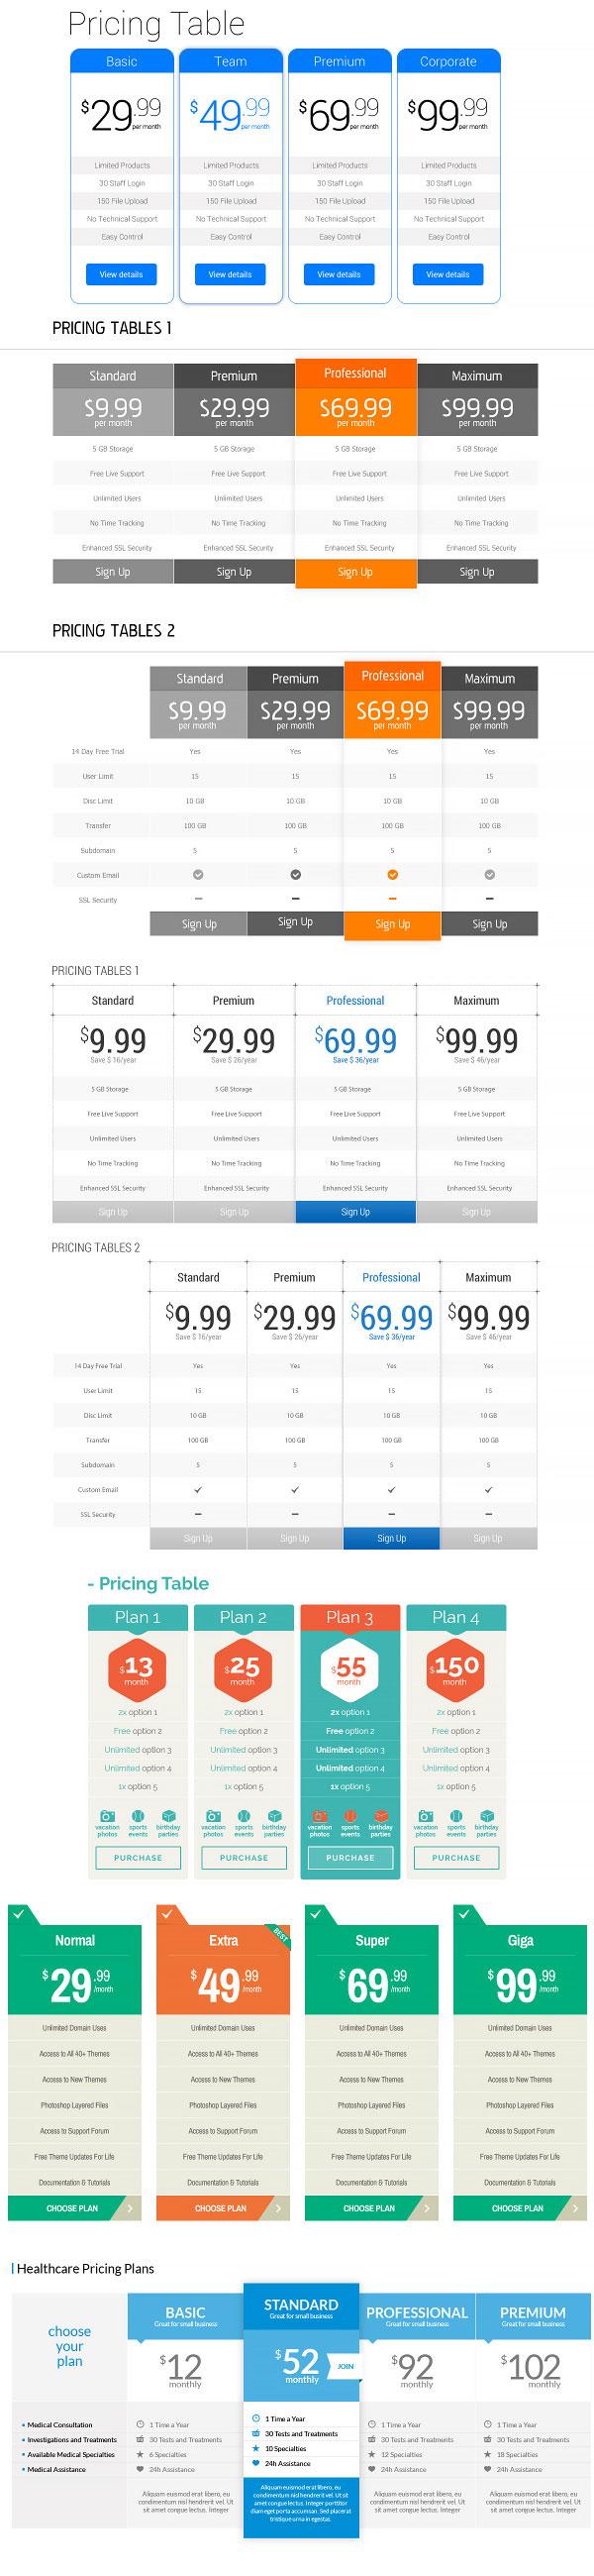 p540 - لایه باز پلن های نمایش هاستینگ یا دیگر خدمات اینترنتی با گزینه های مختلف / 8 مدل متنوع